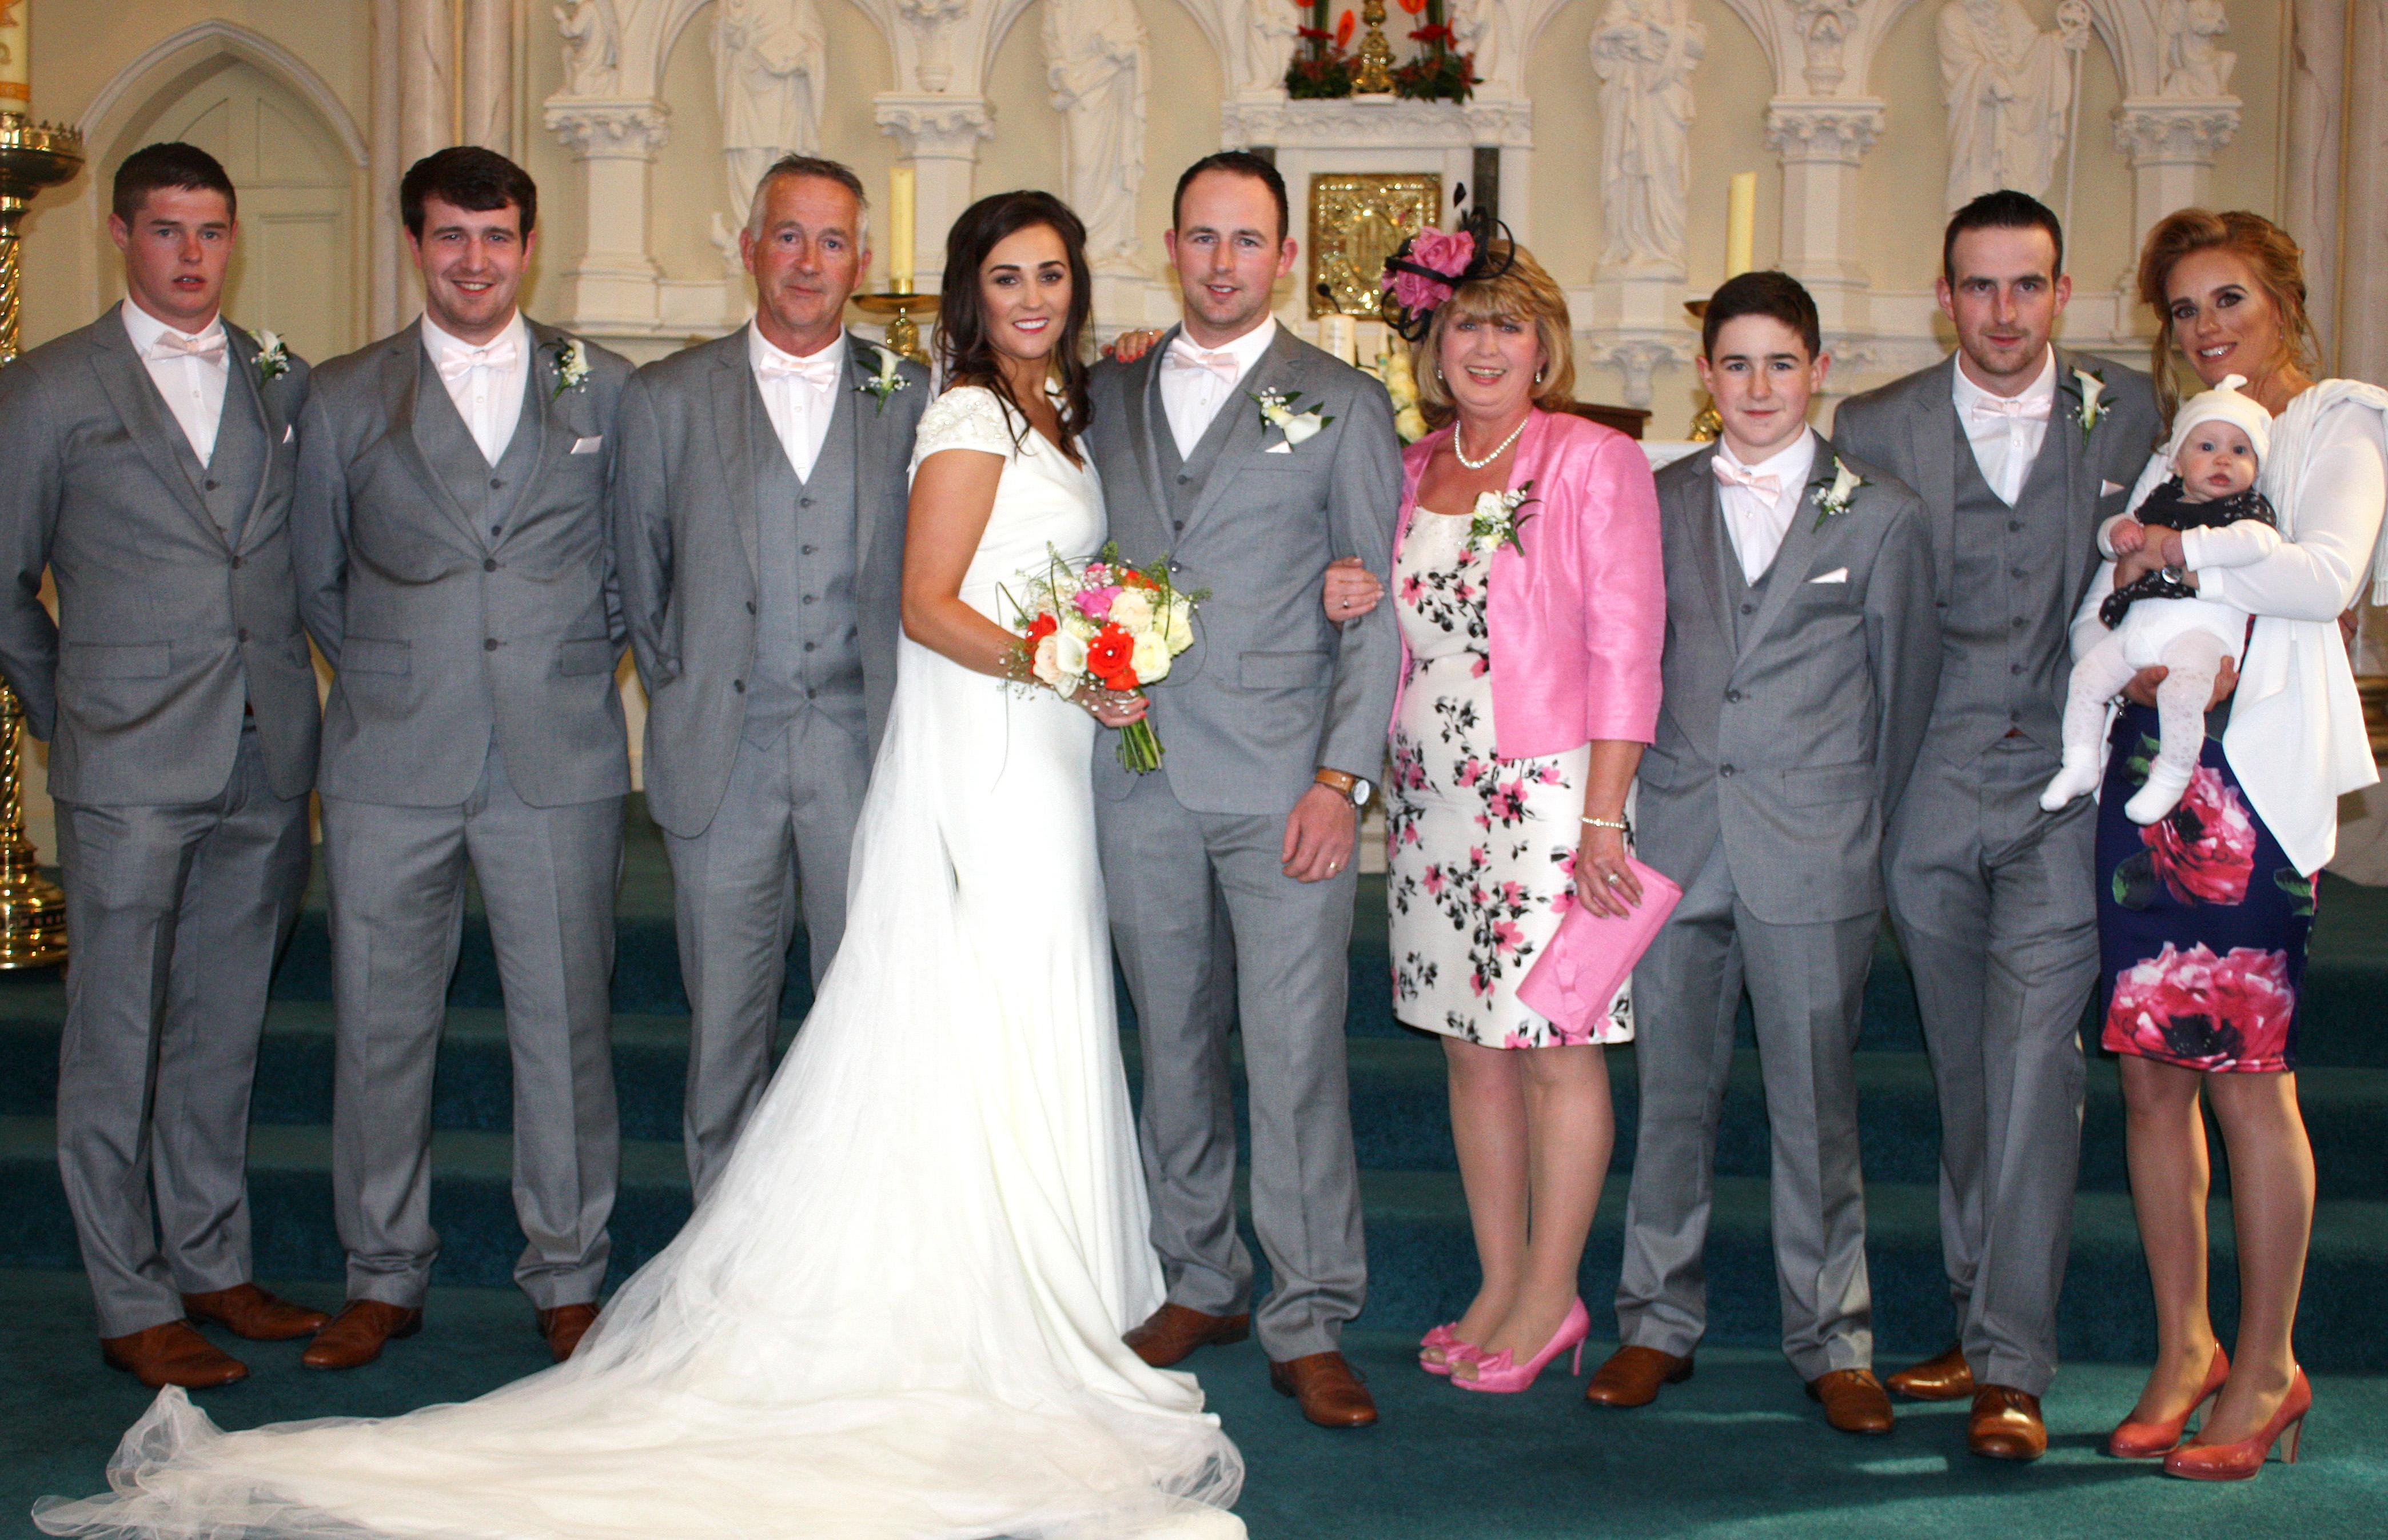 4   The wedding of Laura Doherty & Kieran O'Sullivan